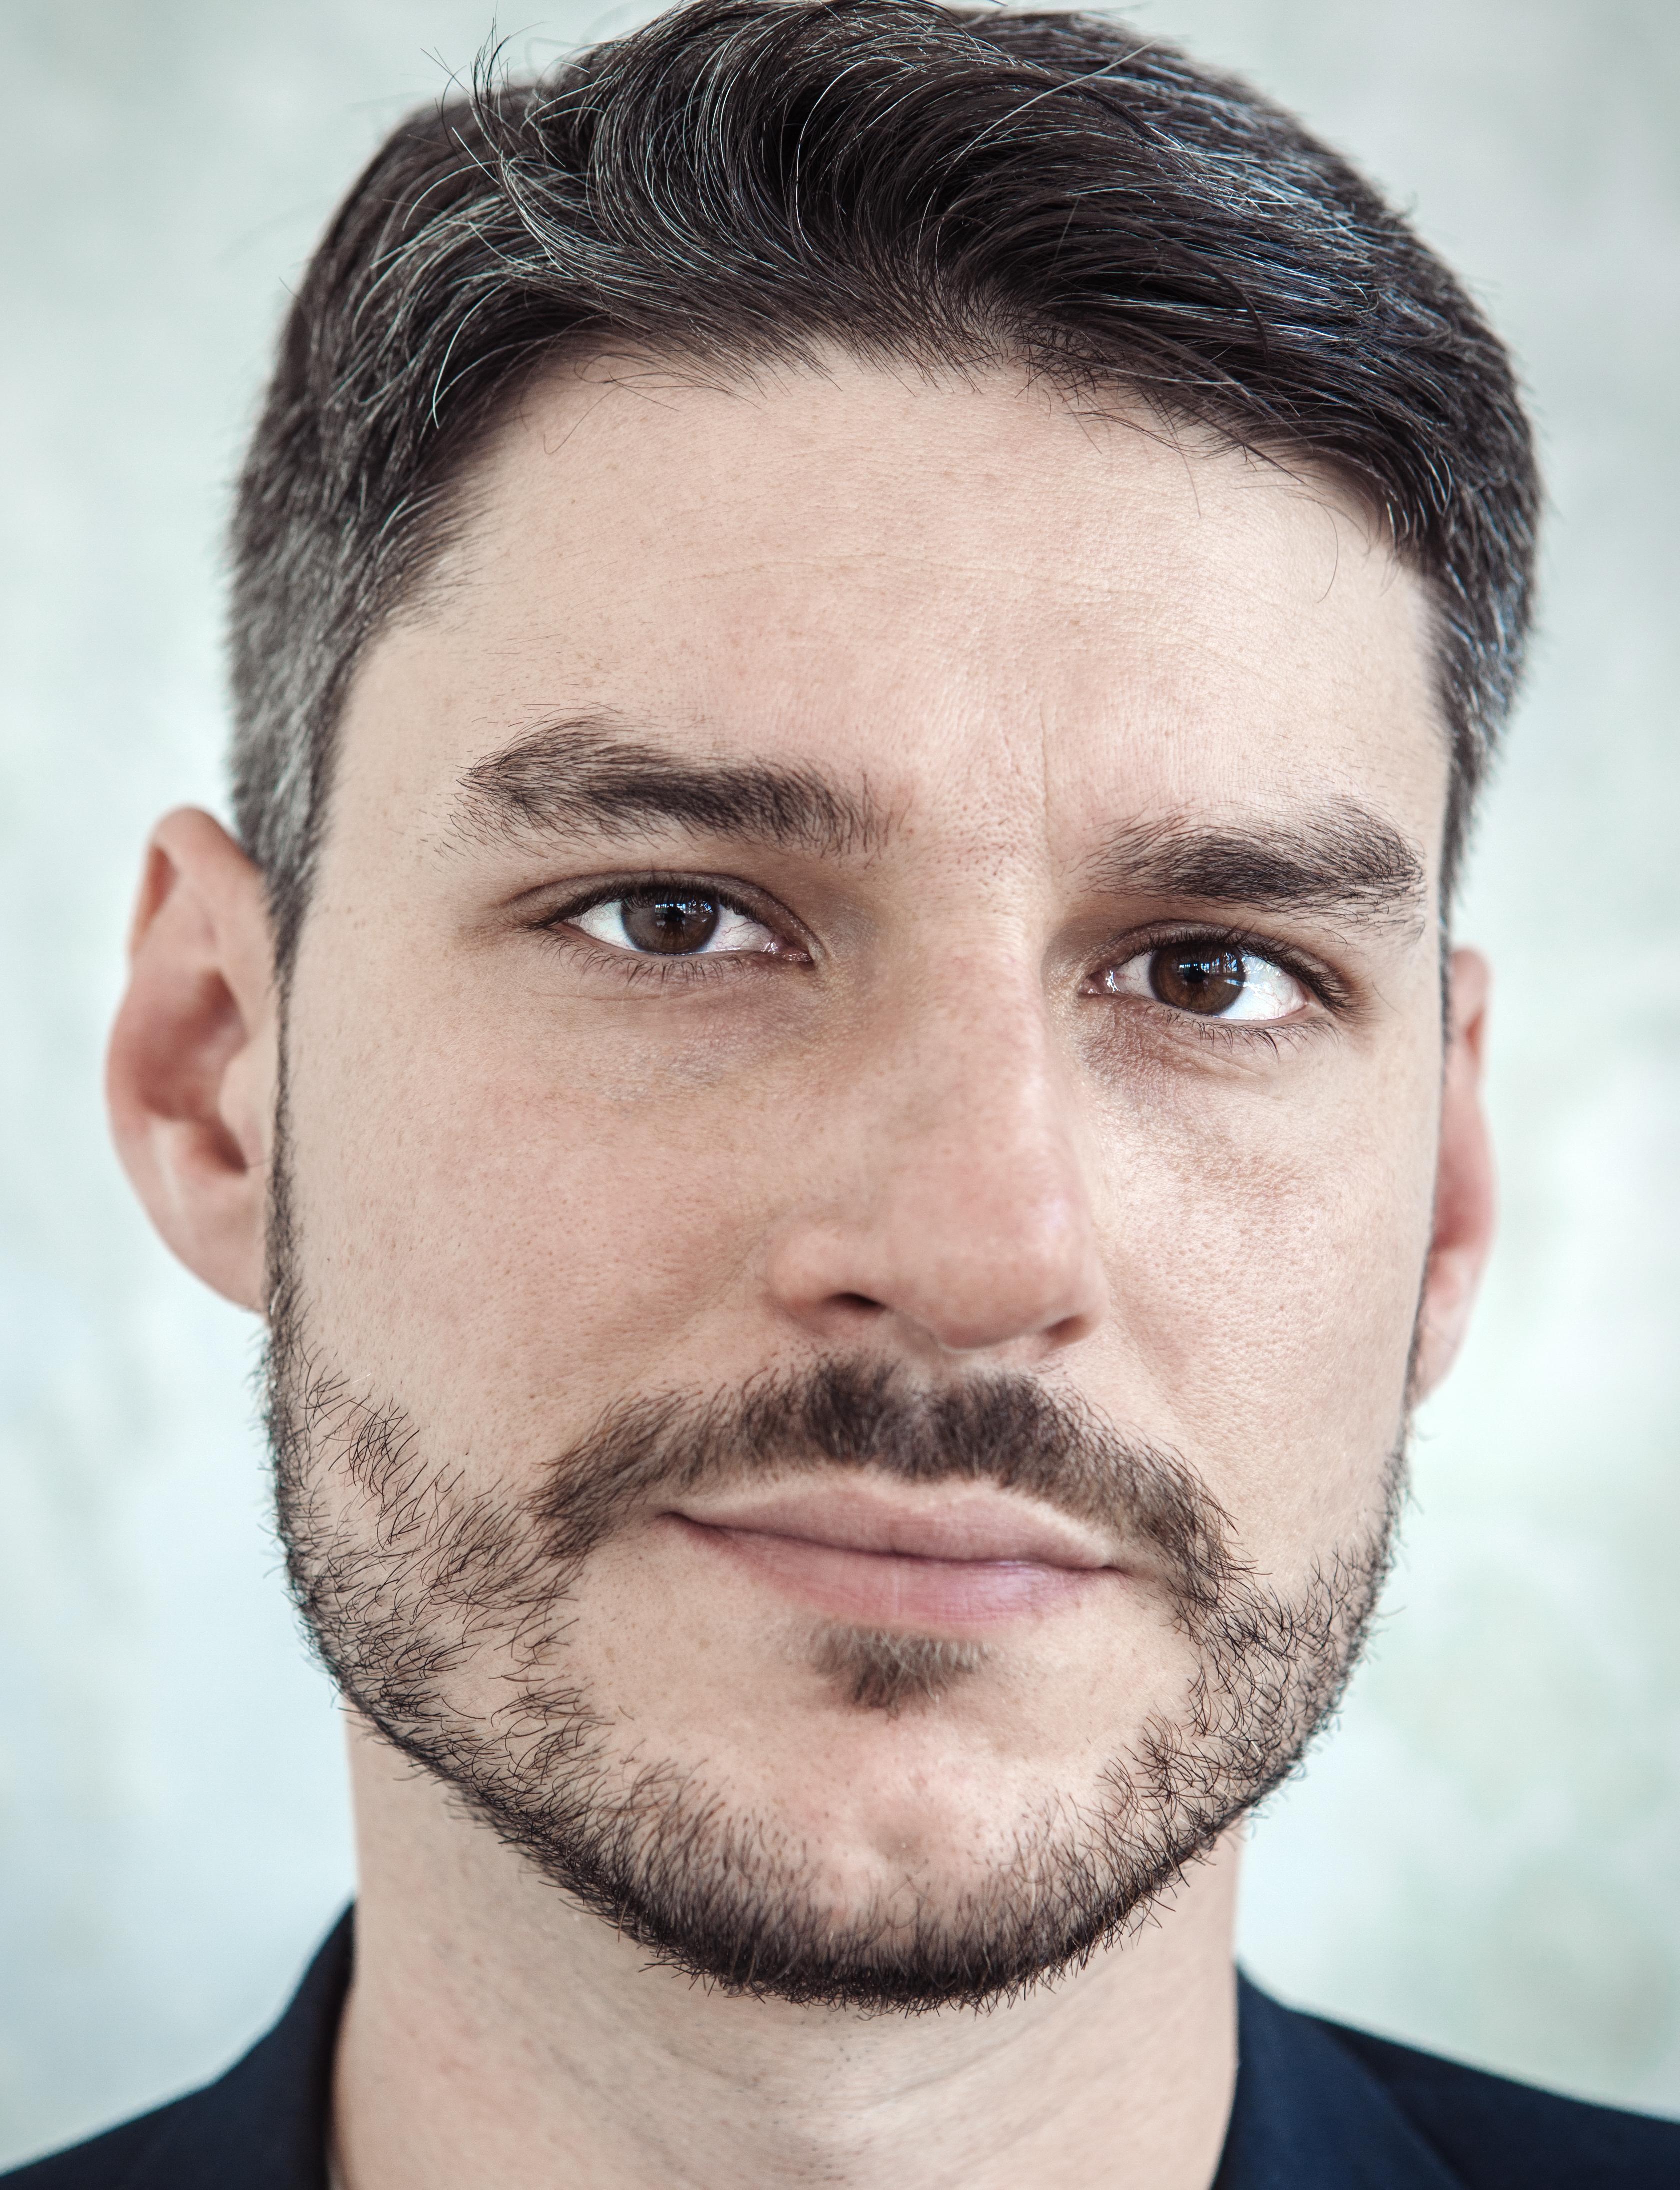 Tomáš Vach